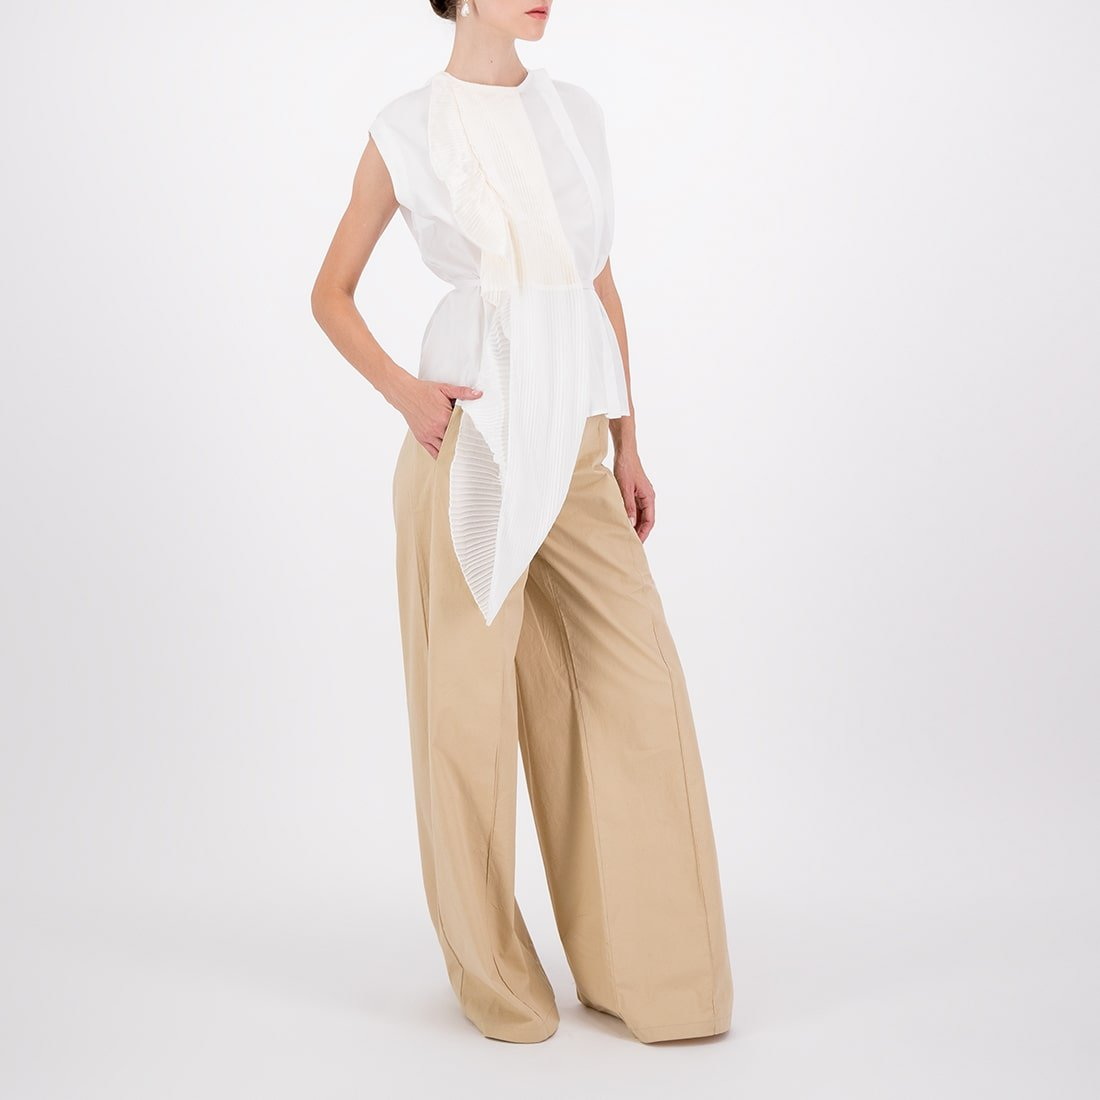 Fabric blend asymmetrical sleeveless top 2